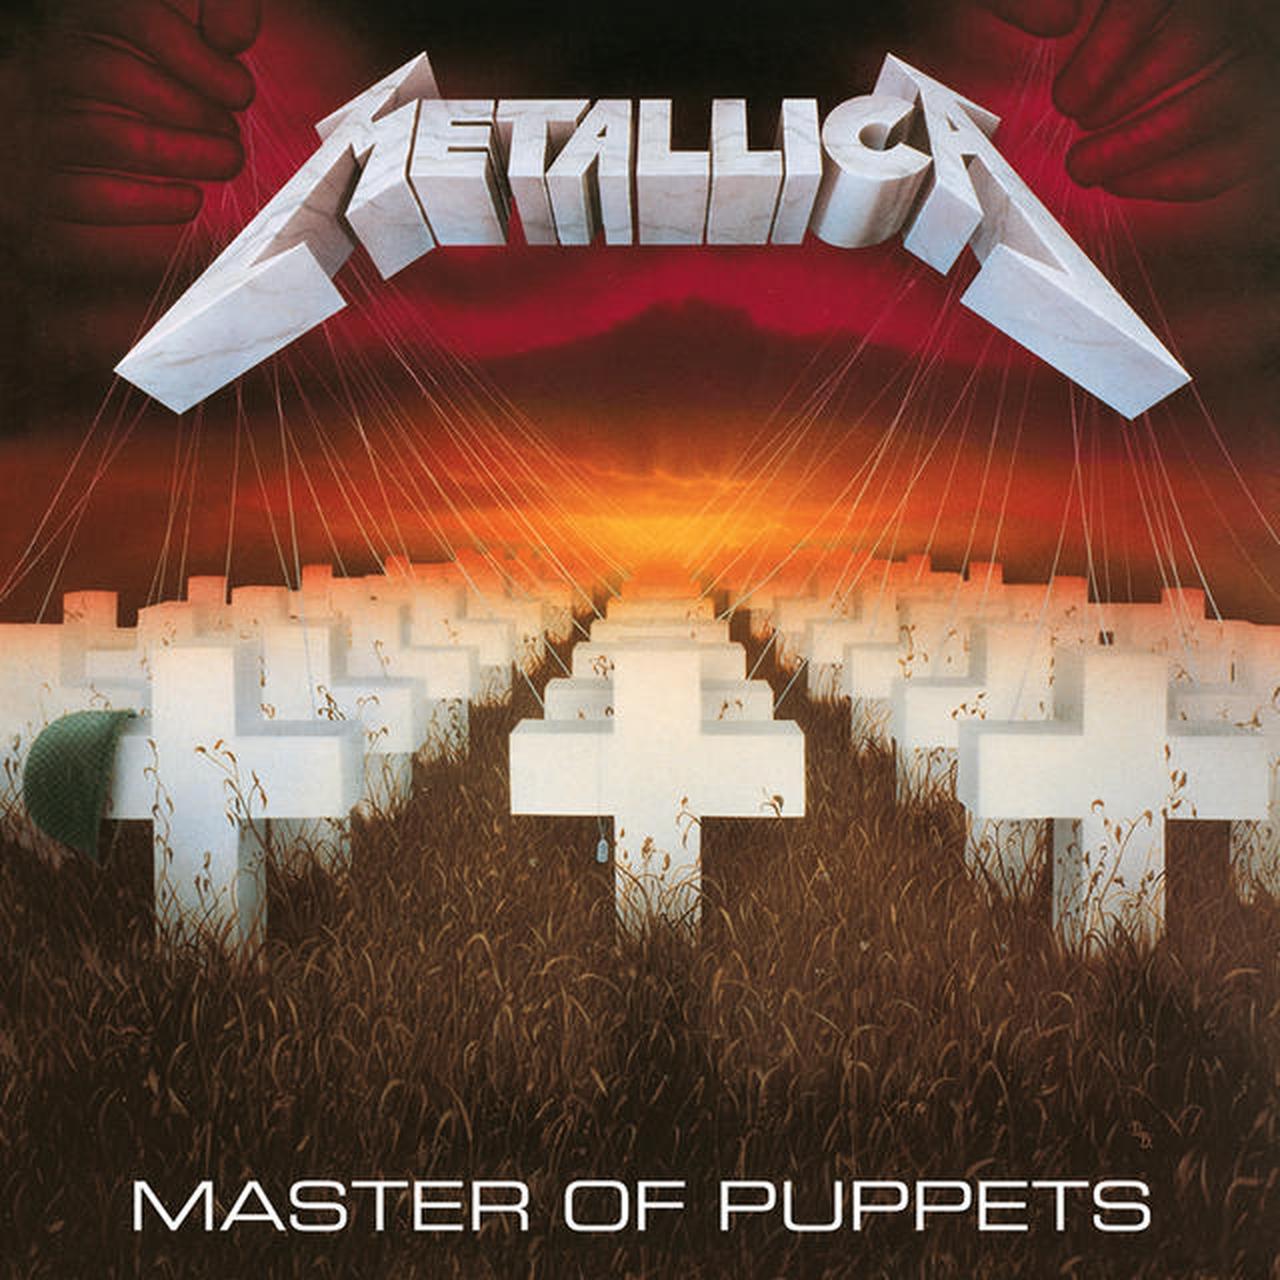 The Mystery Man Behind Metallica's Metal Merch